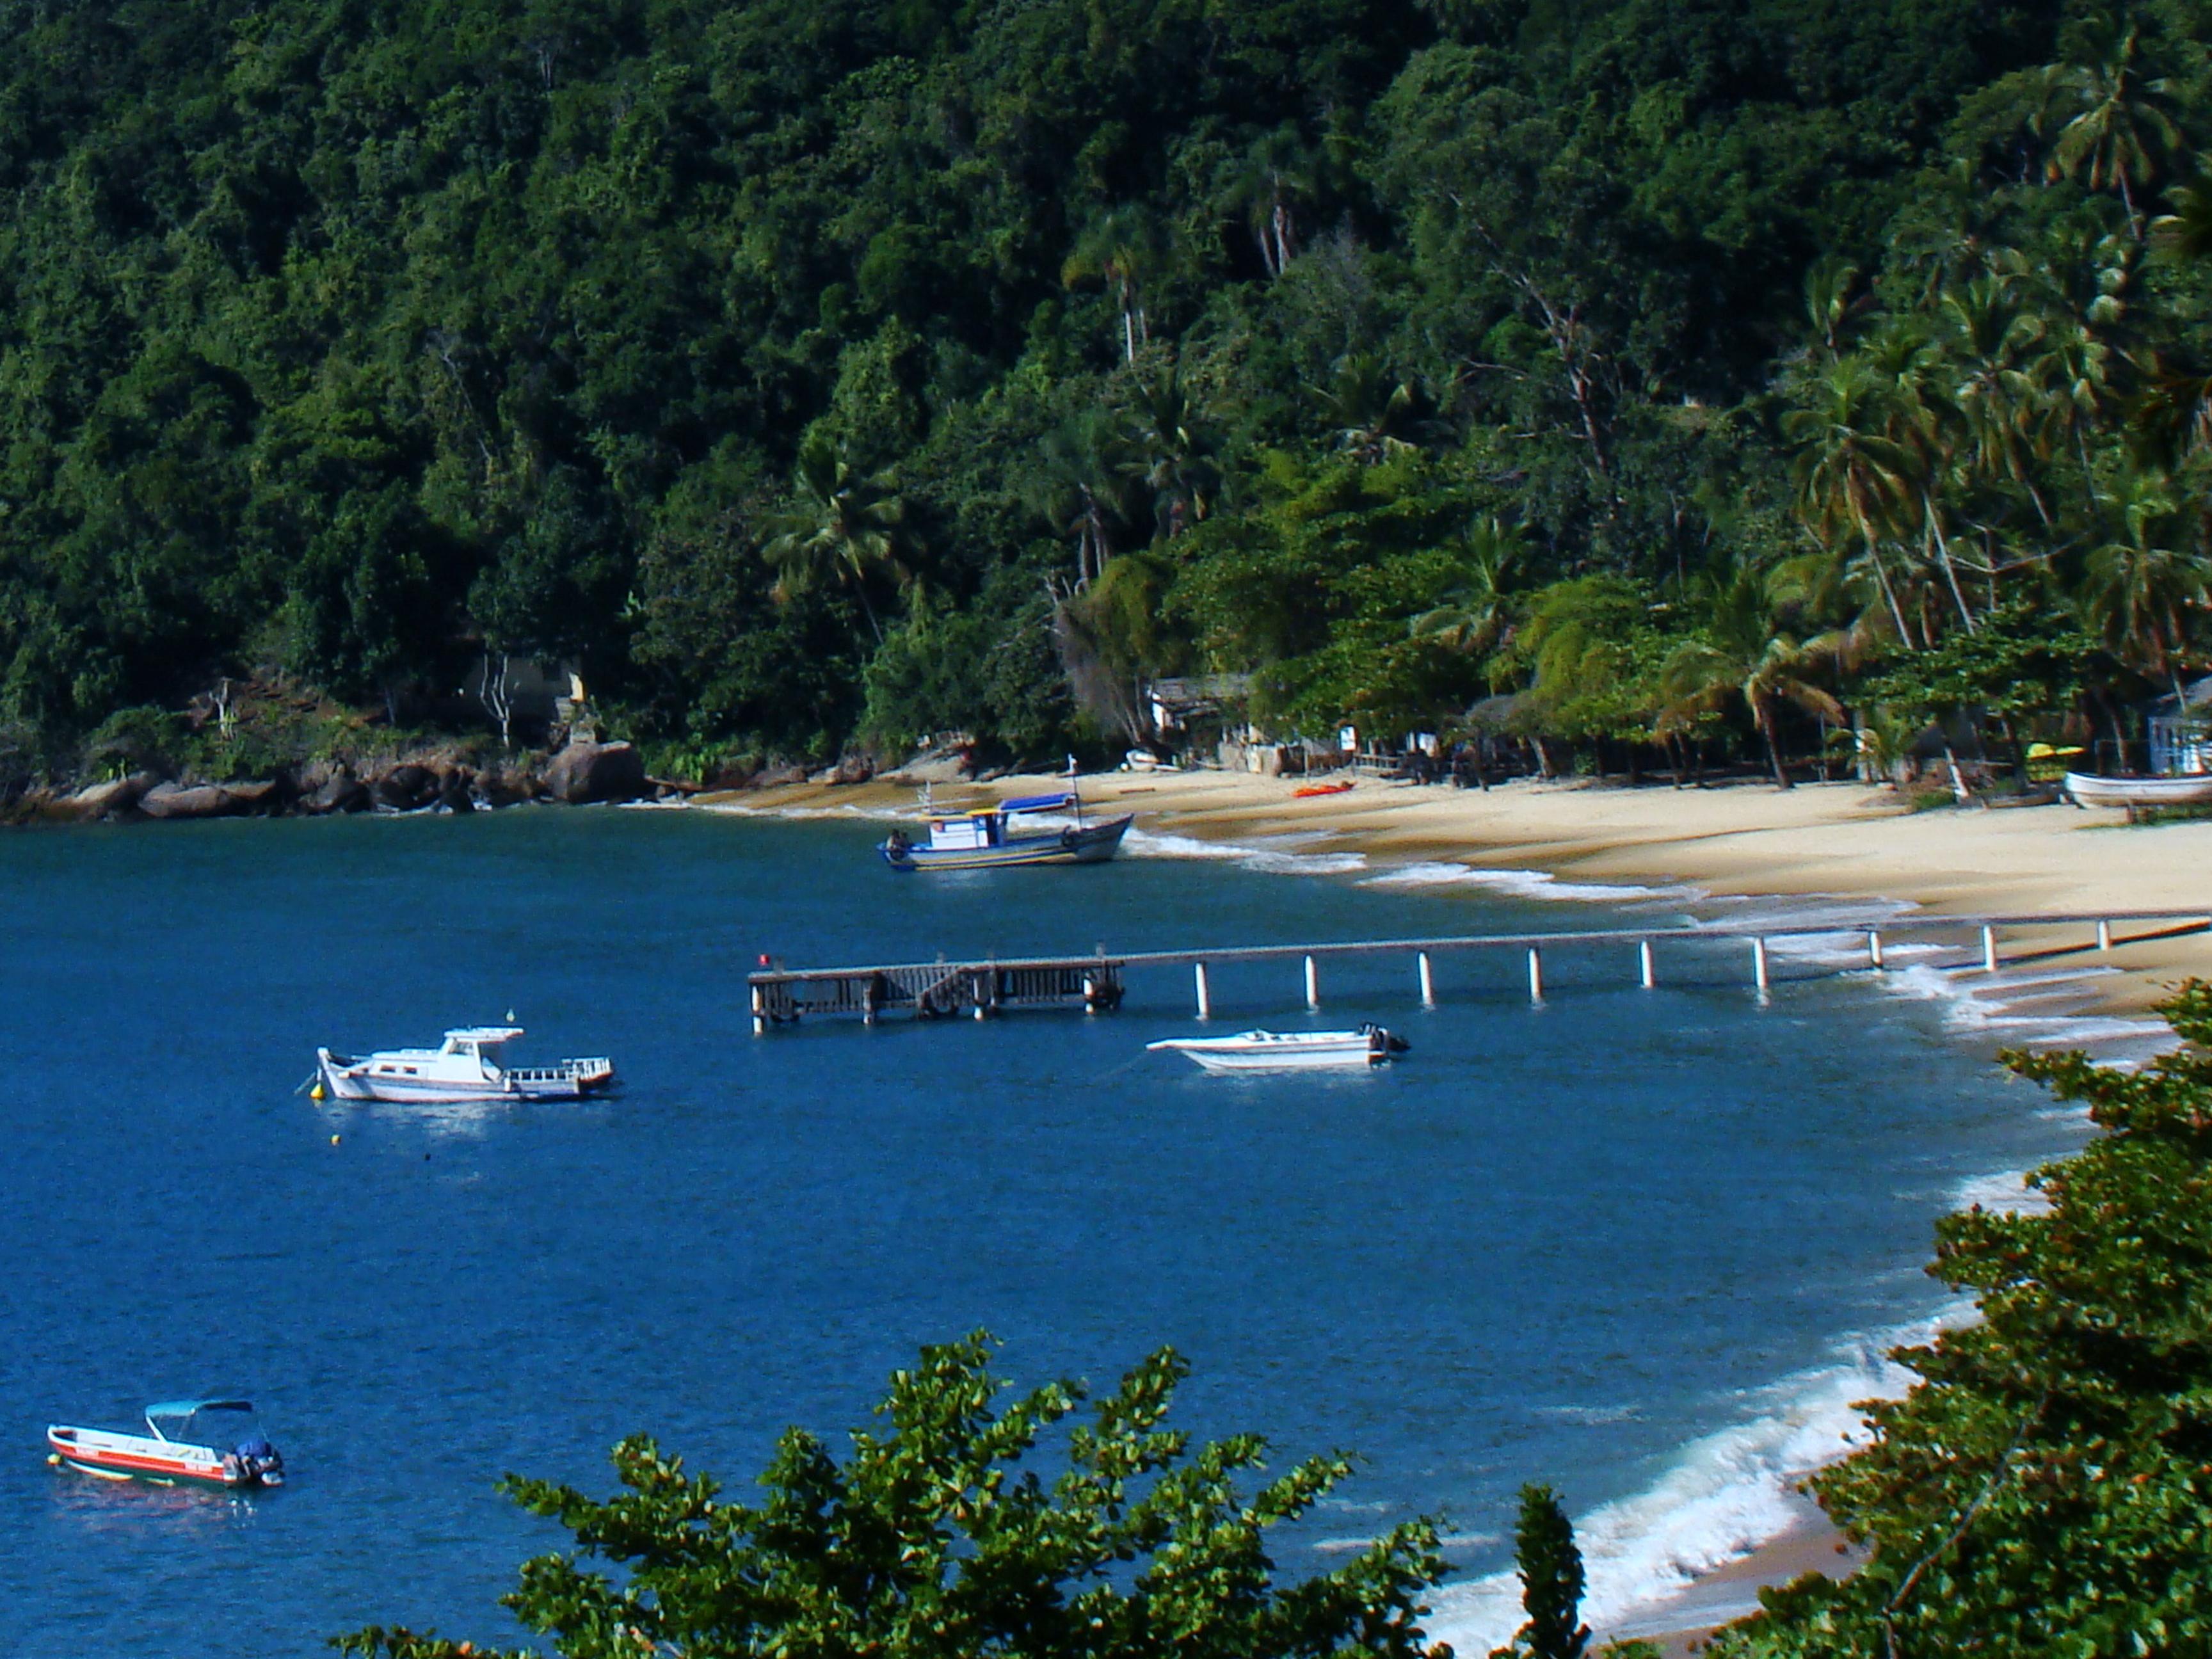 Noleggio Barche Enseada do Pouso - Navalia   Noleggia un Sogno